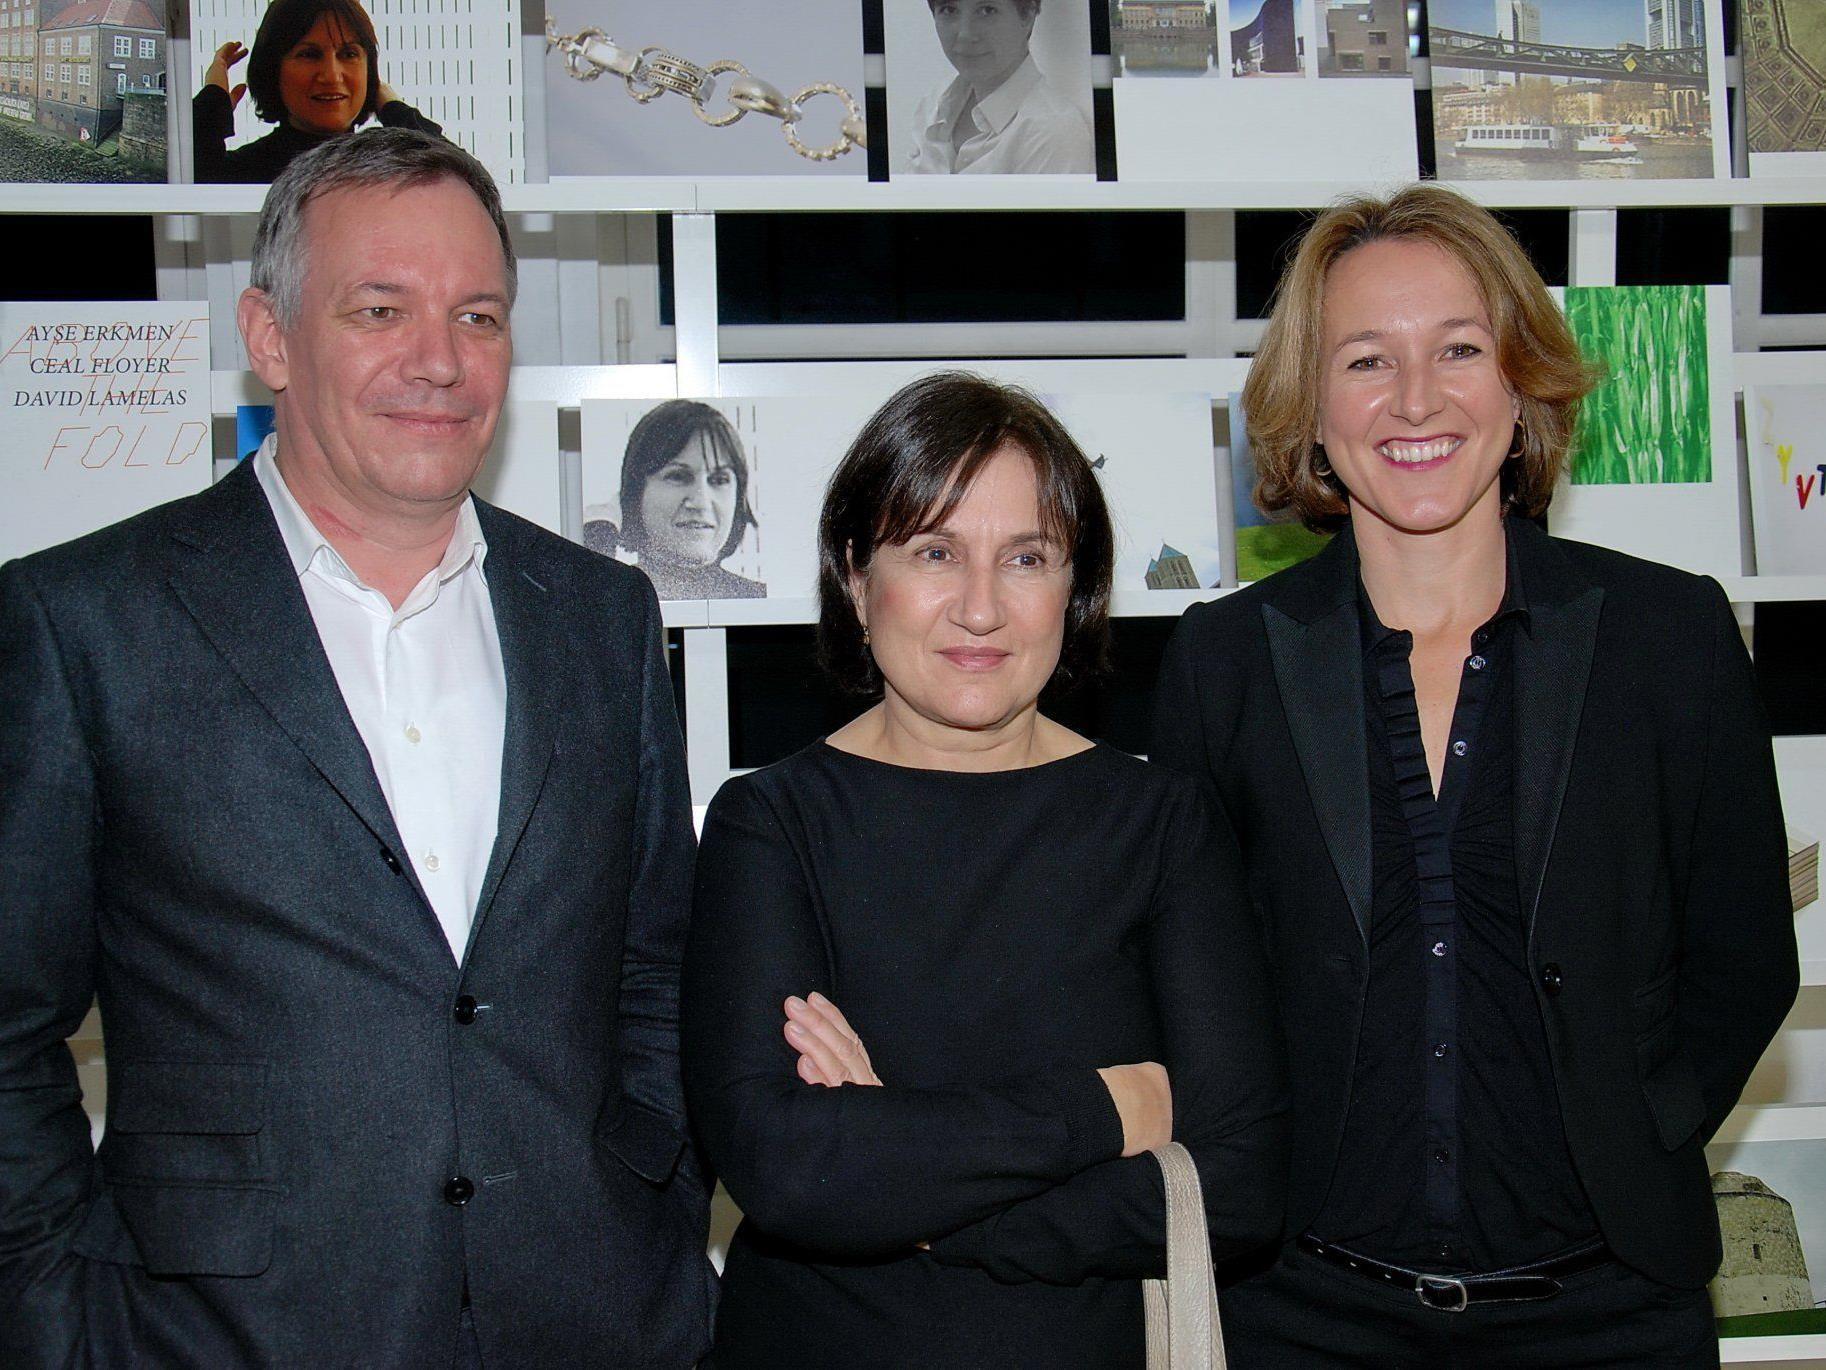 Wolfgang Fetz sowie Ayse Erkmen und Kulturstadträtin Judith Reichart.